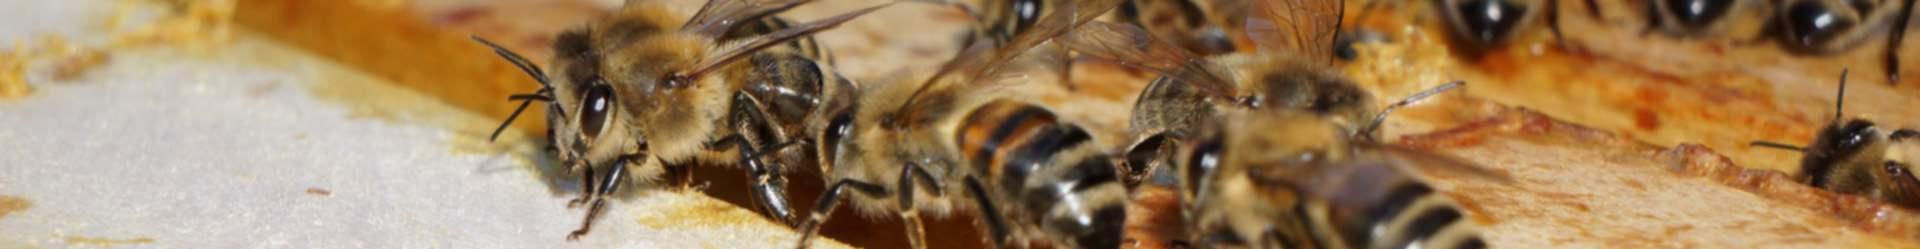 Honig aus Nürnberg Mögeldorf – Sommer 2019